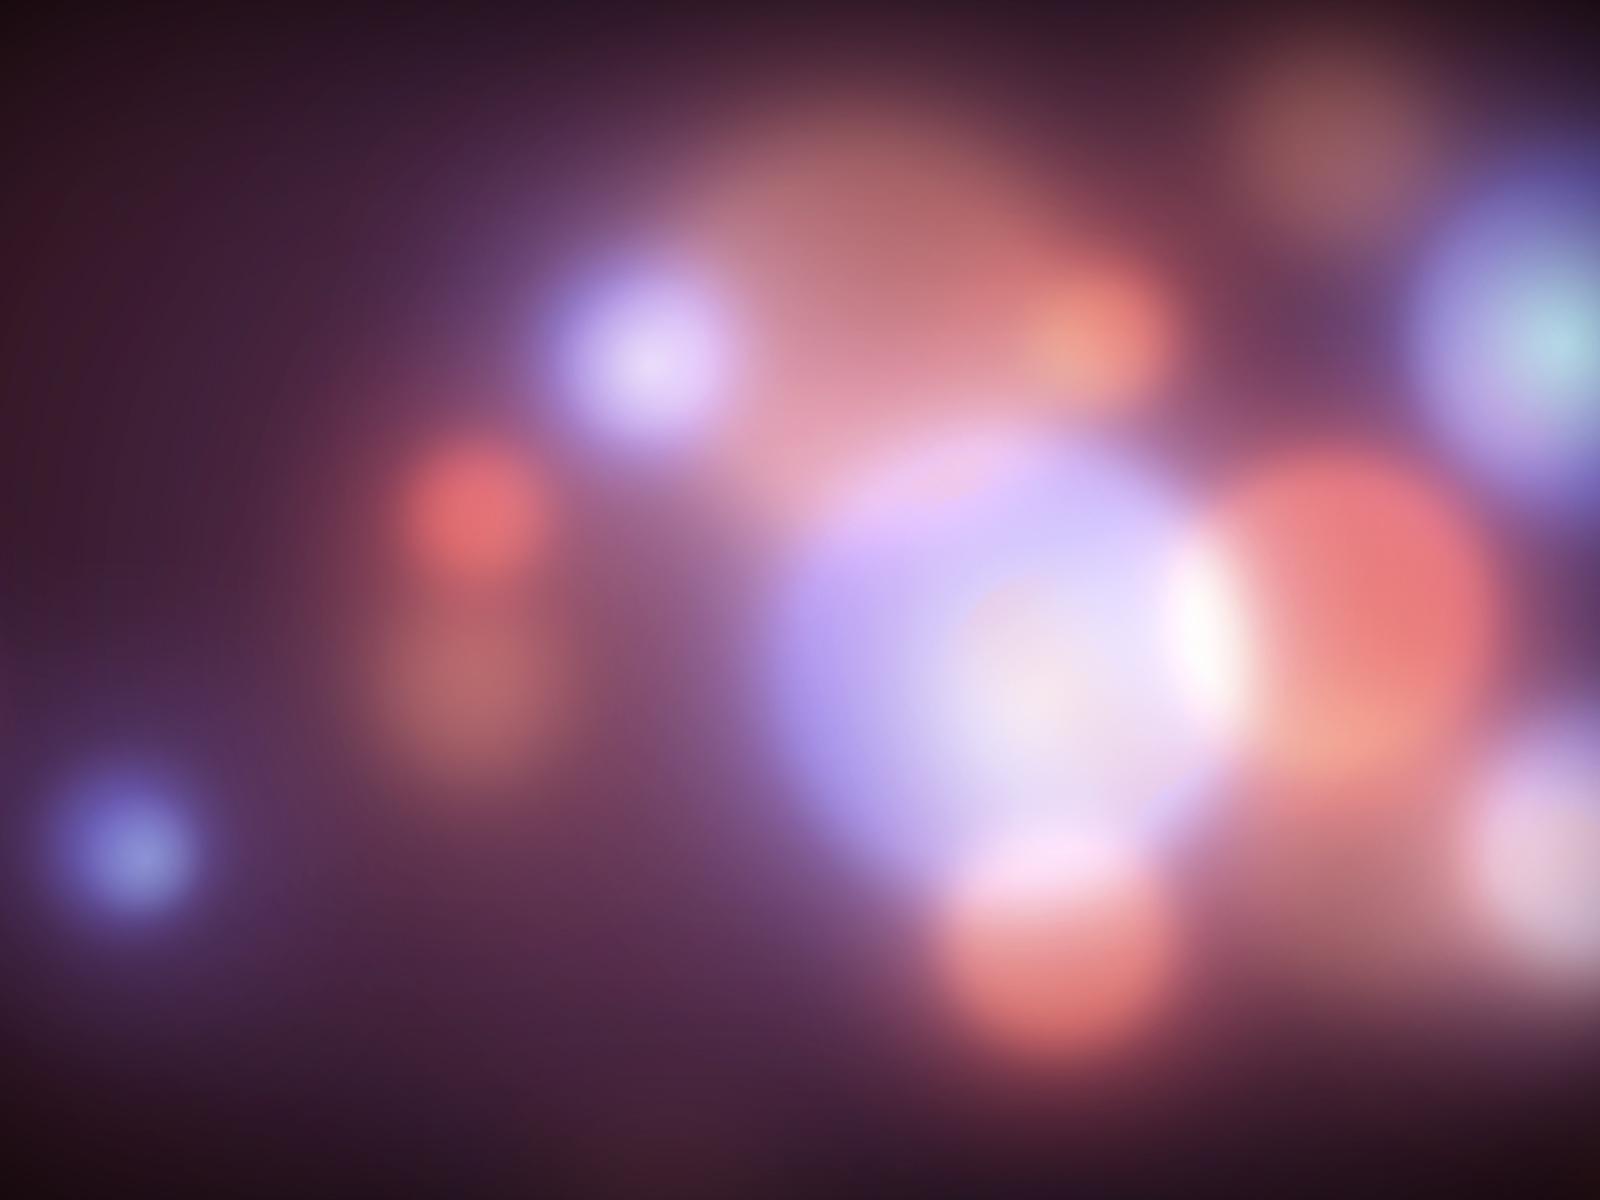 Wallpaperfreeks Light Effects Wallpapers 1600x1200